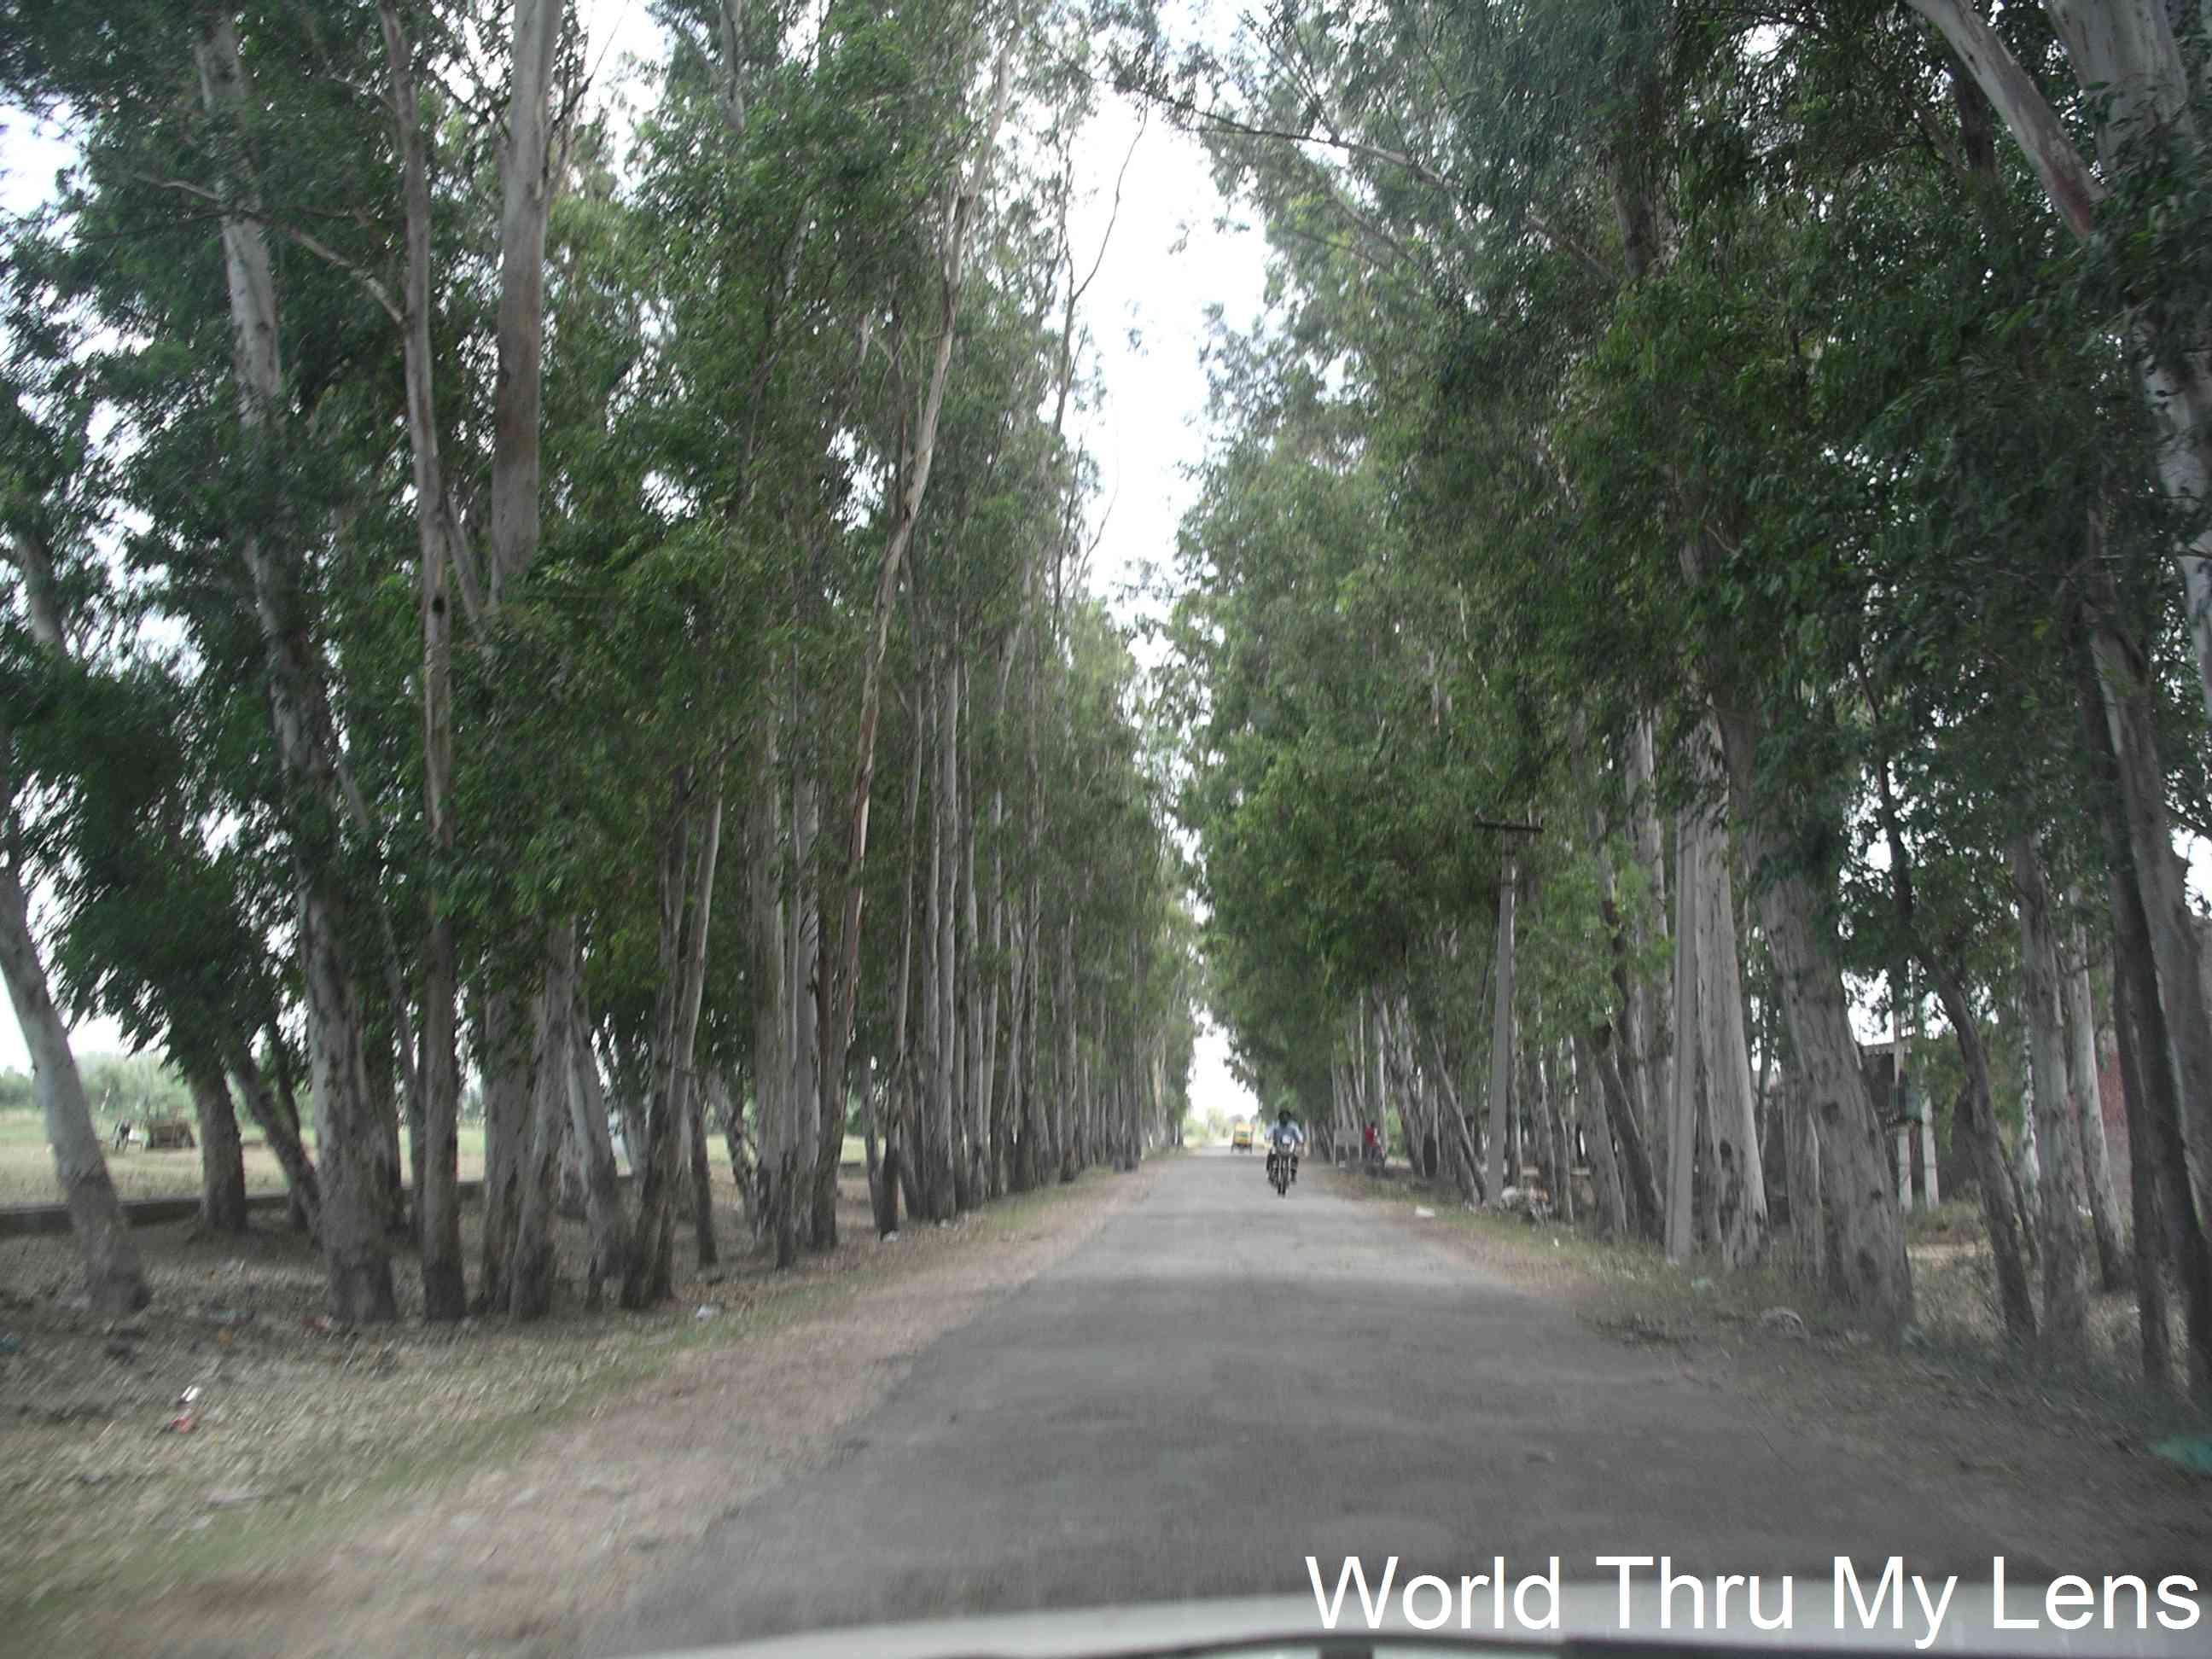 On the way to Suchetgarh